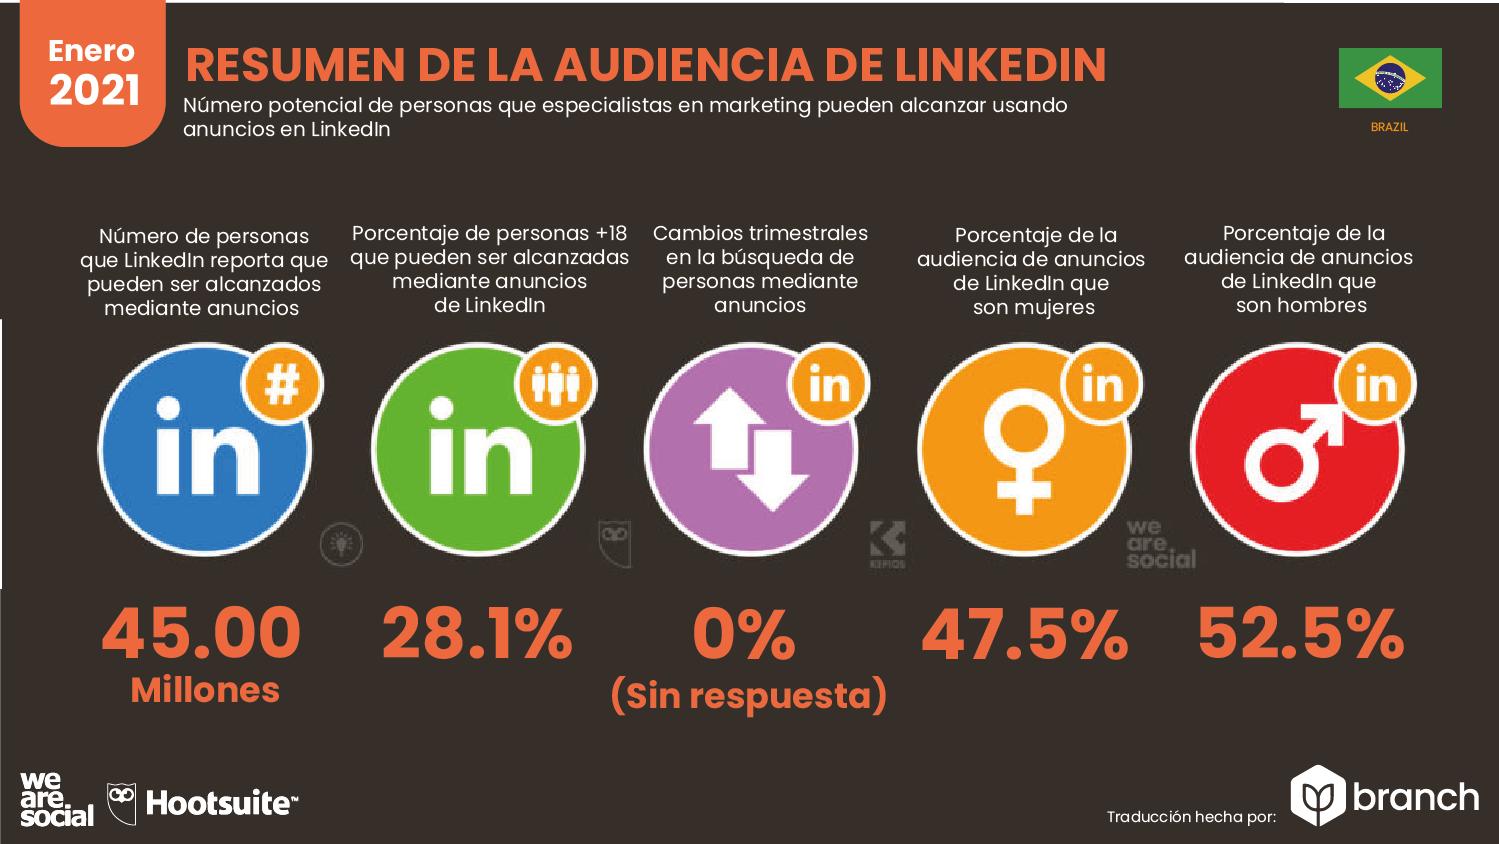 audiencia-de-LinkedIn-en-brasil-2020-2021